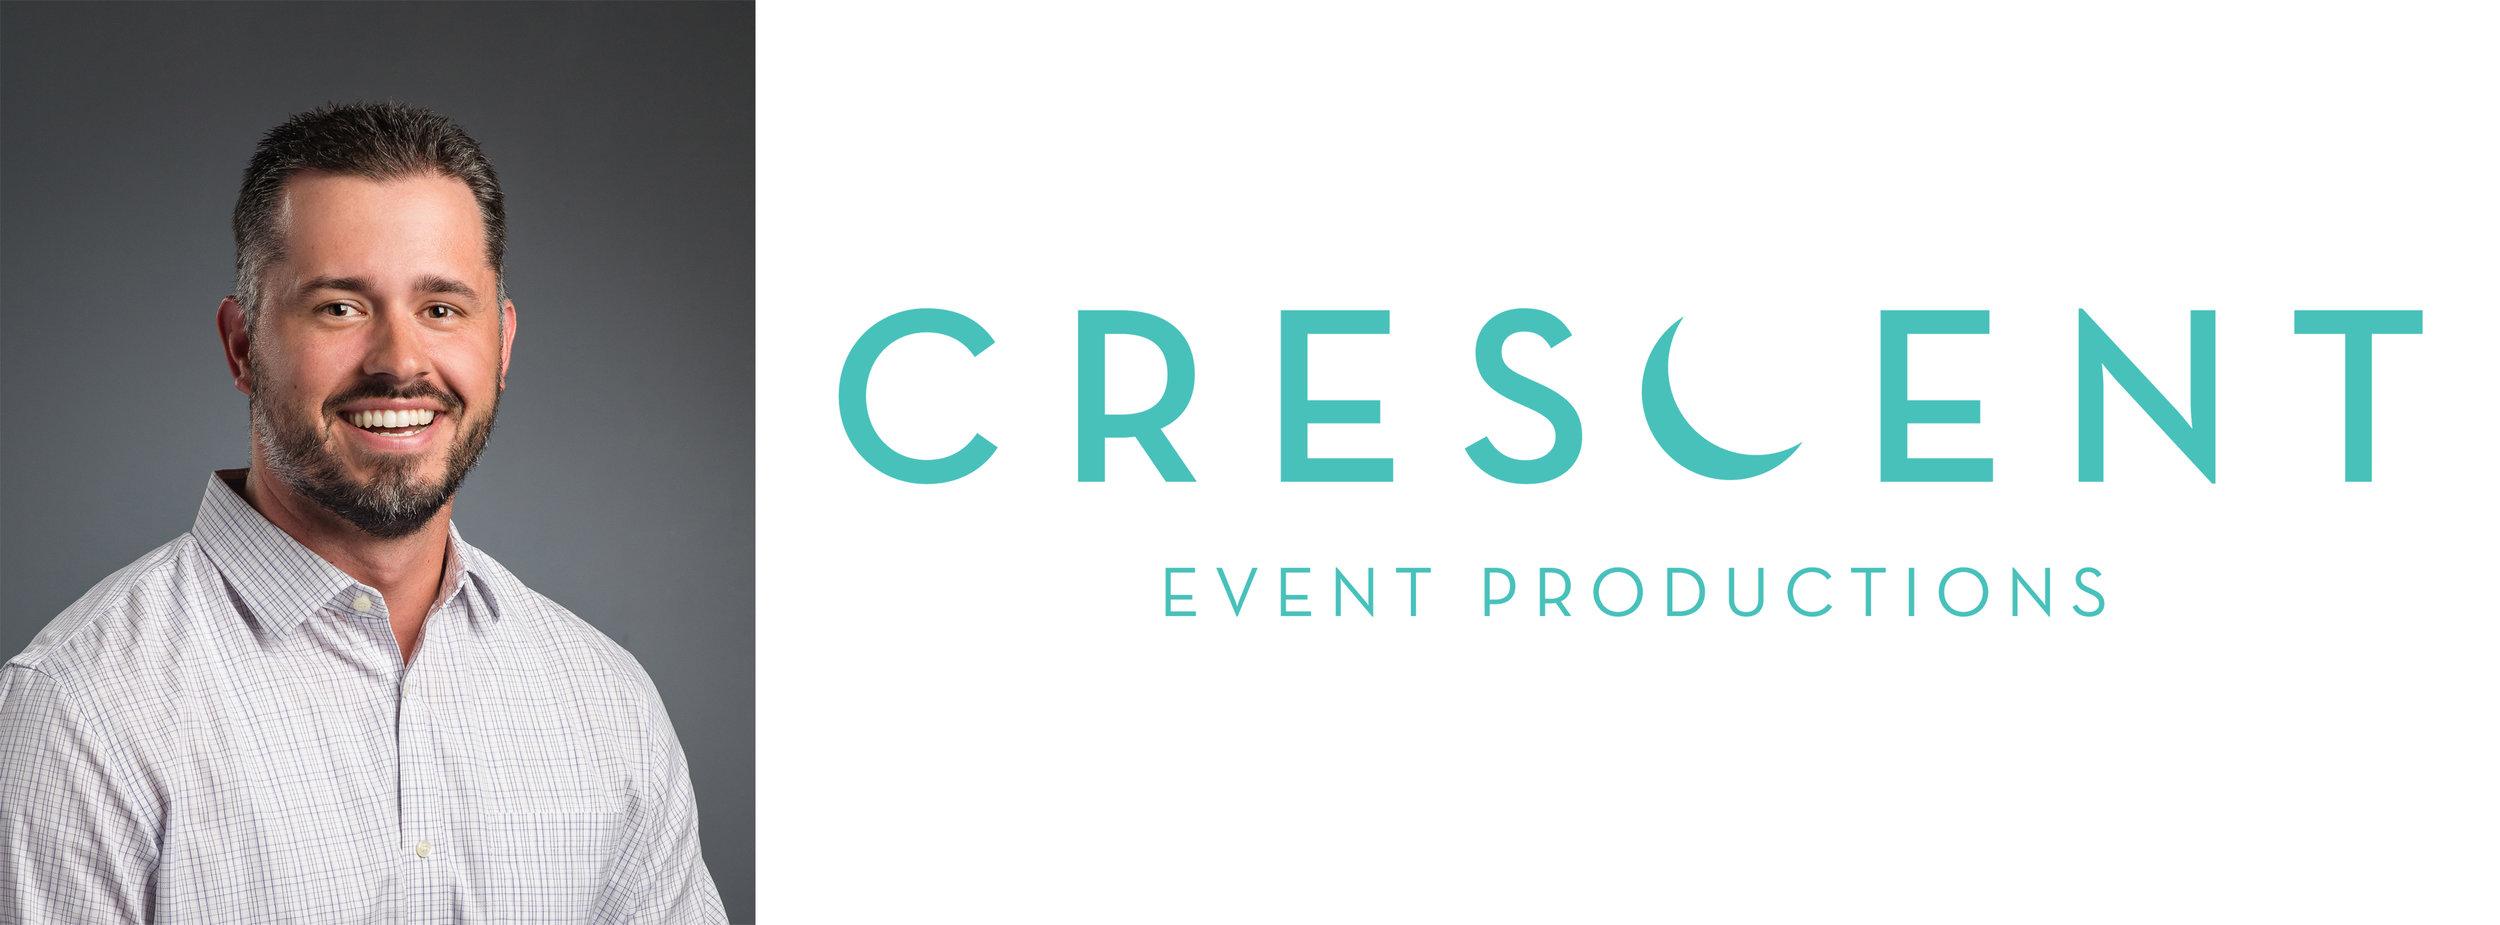 Christopher Gerhart | Crescent Event Productions